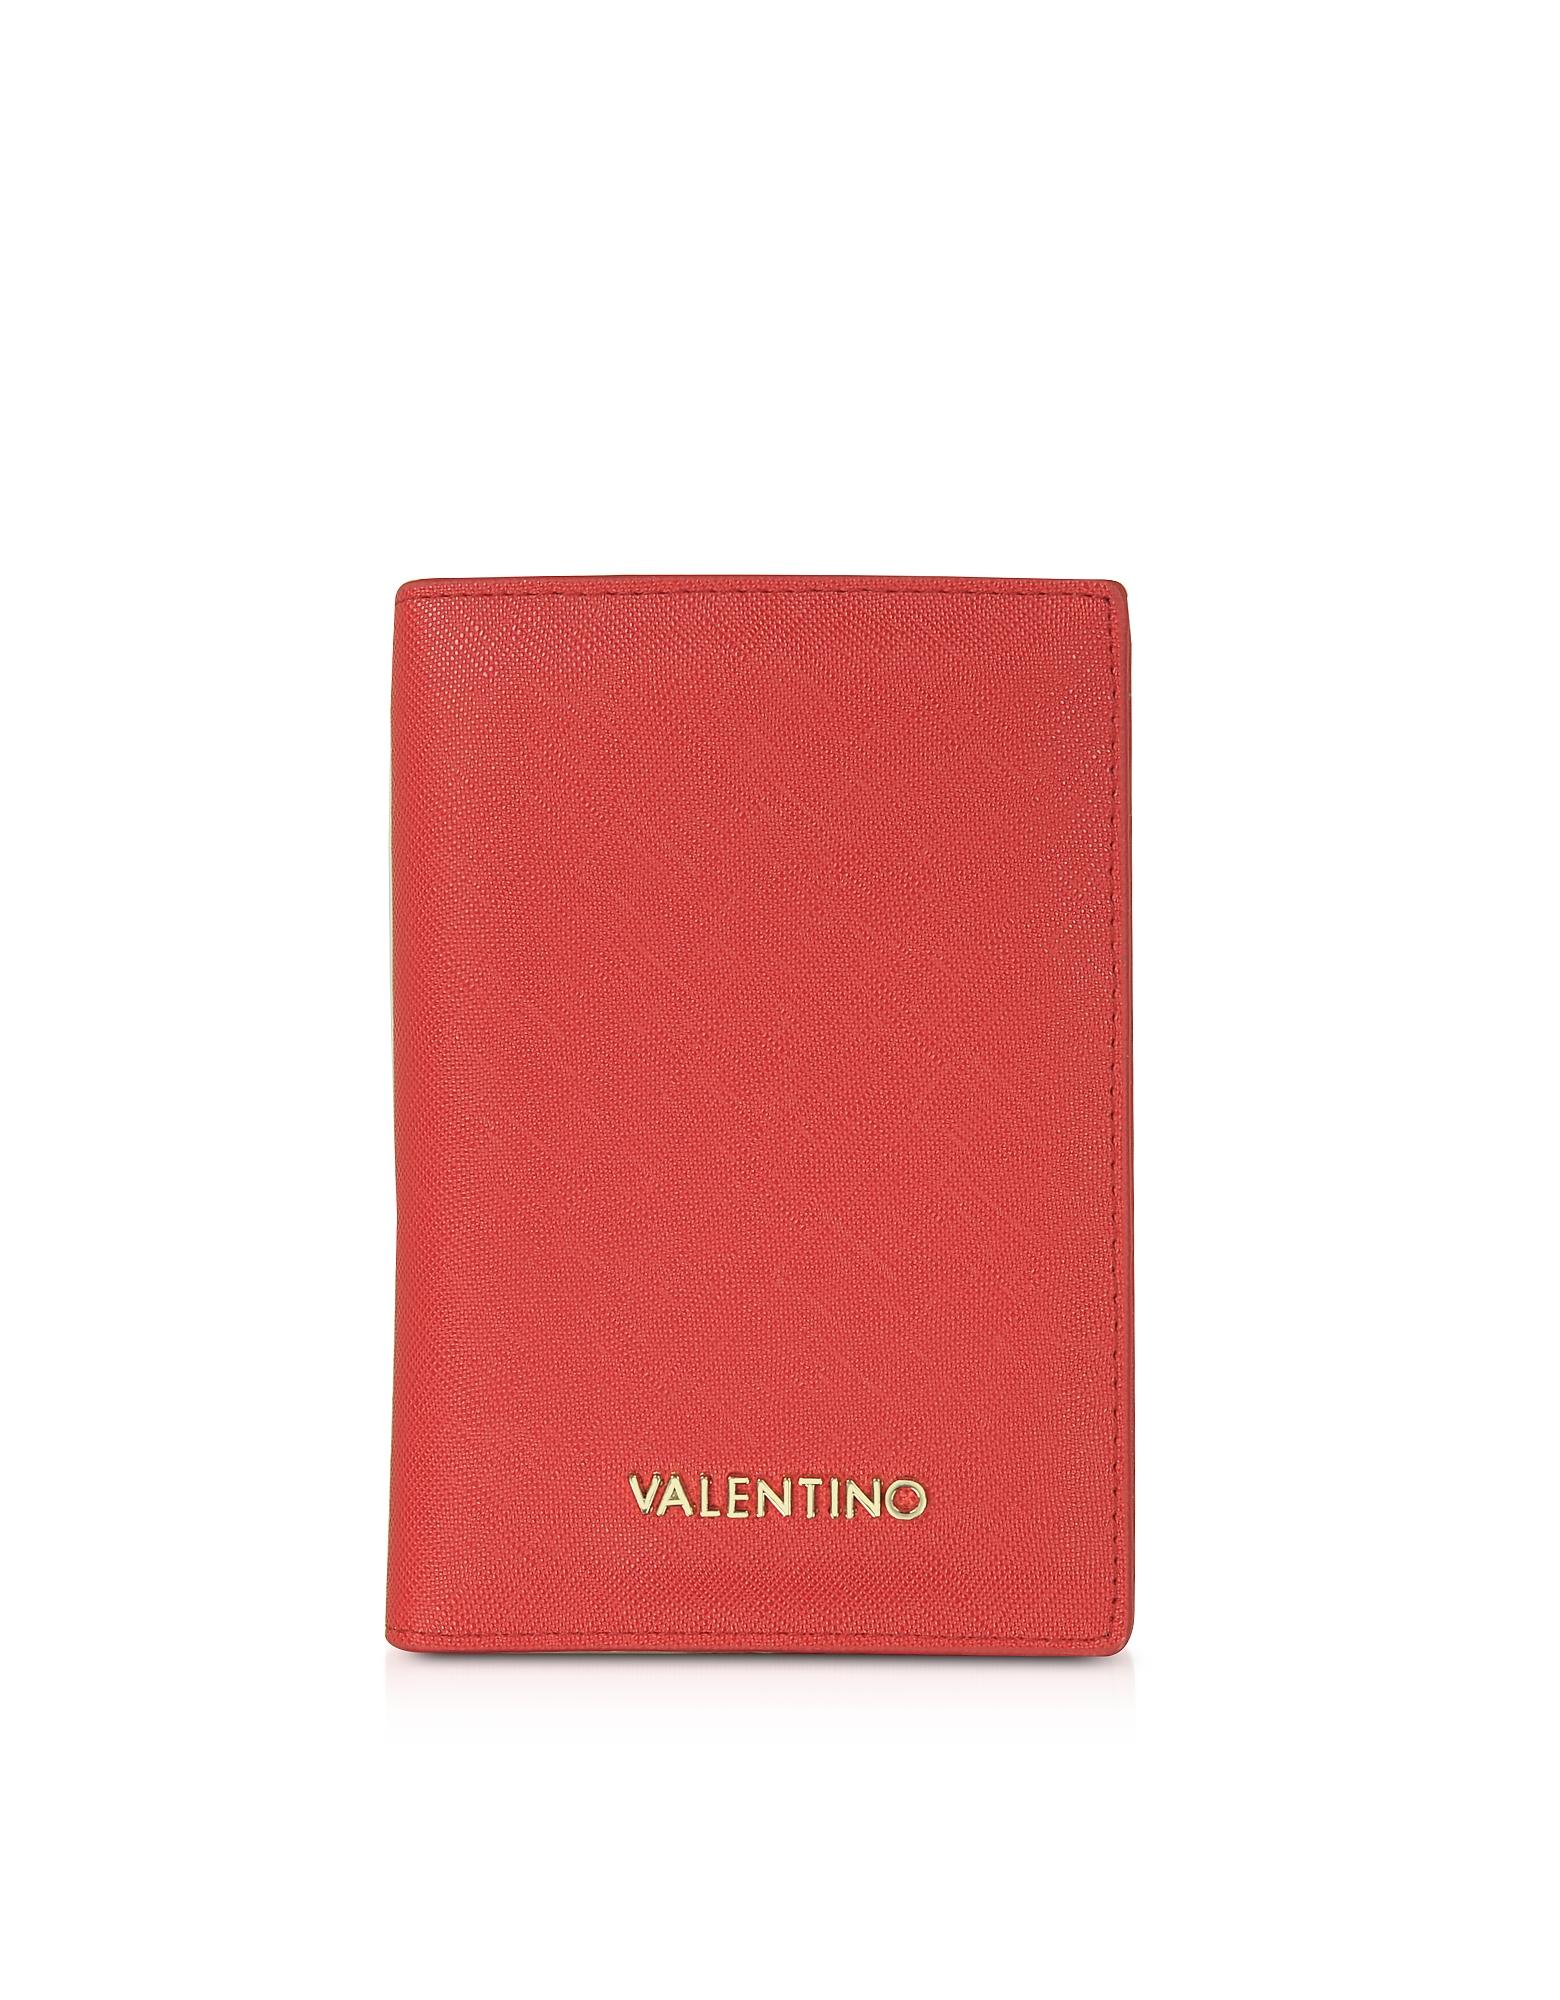 VALENTINO by Mario Valentino 钱包, Sea Saffiano Eco Leather Passport Holder